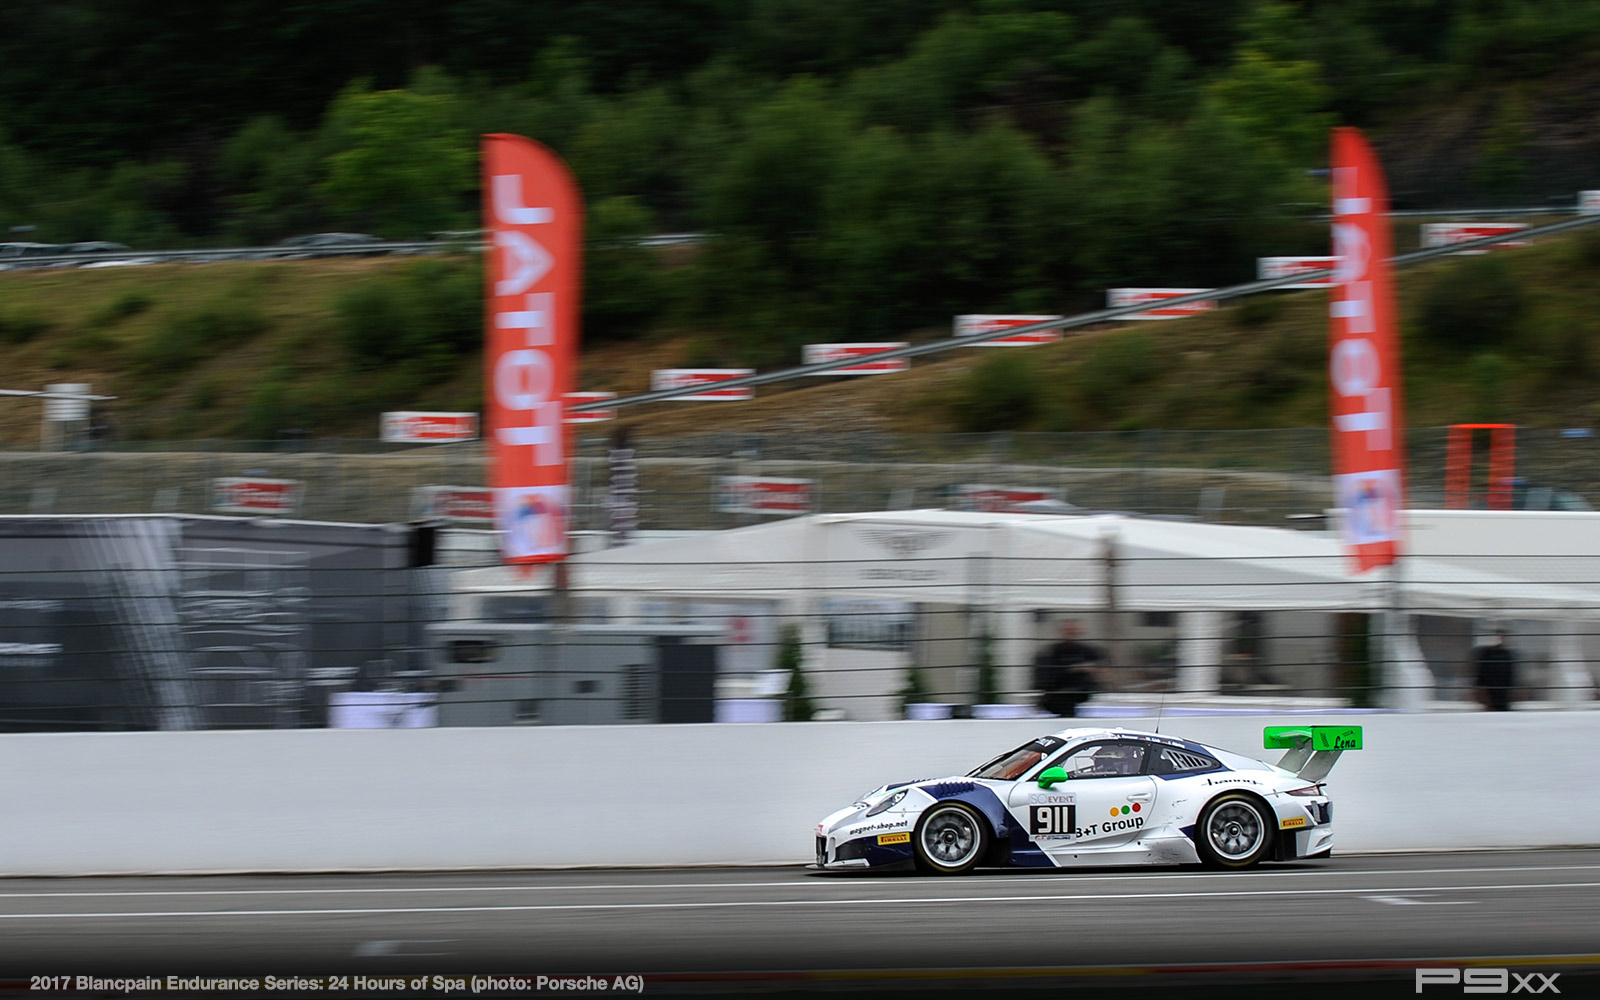 2017-24-Hours-of-Spa-Porsche-307